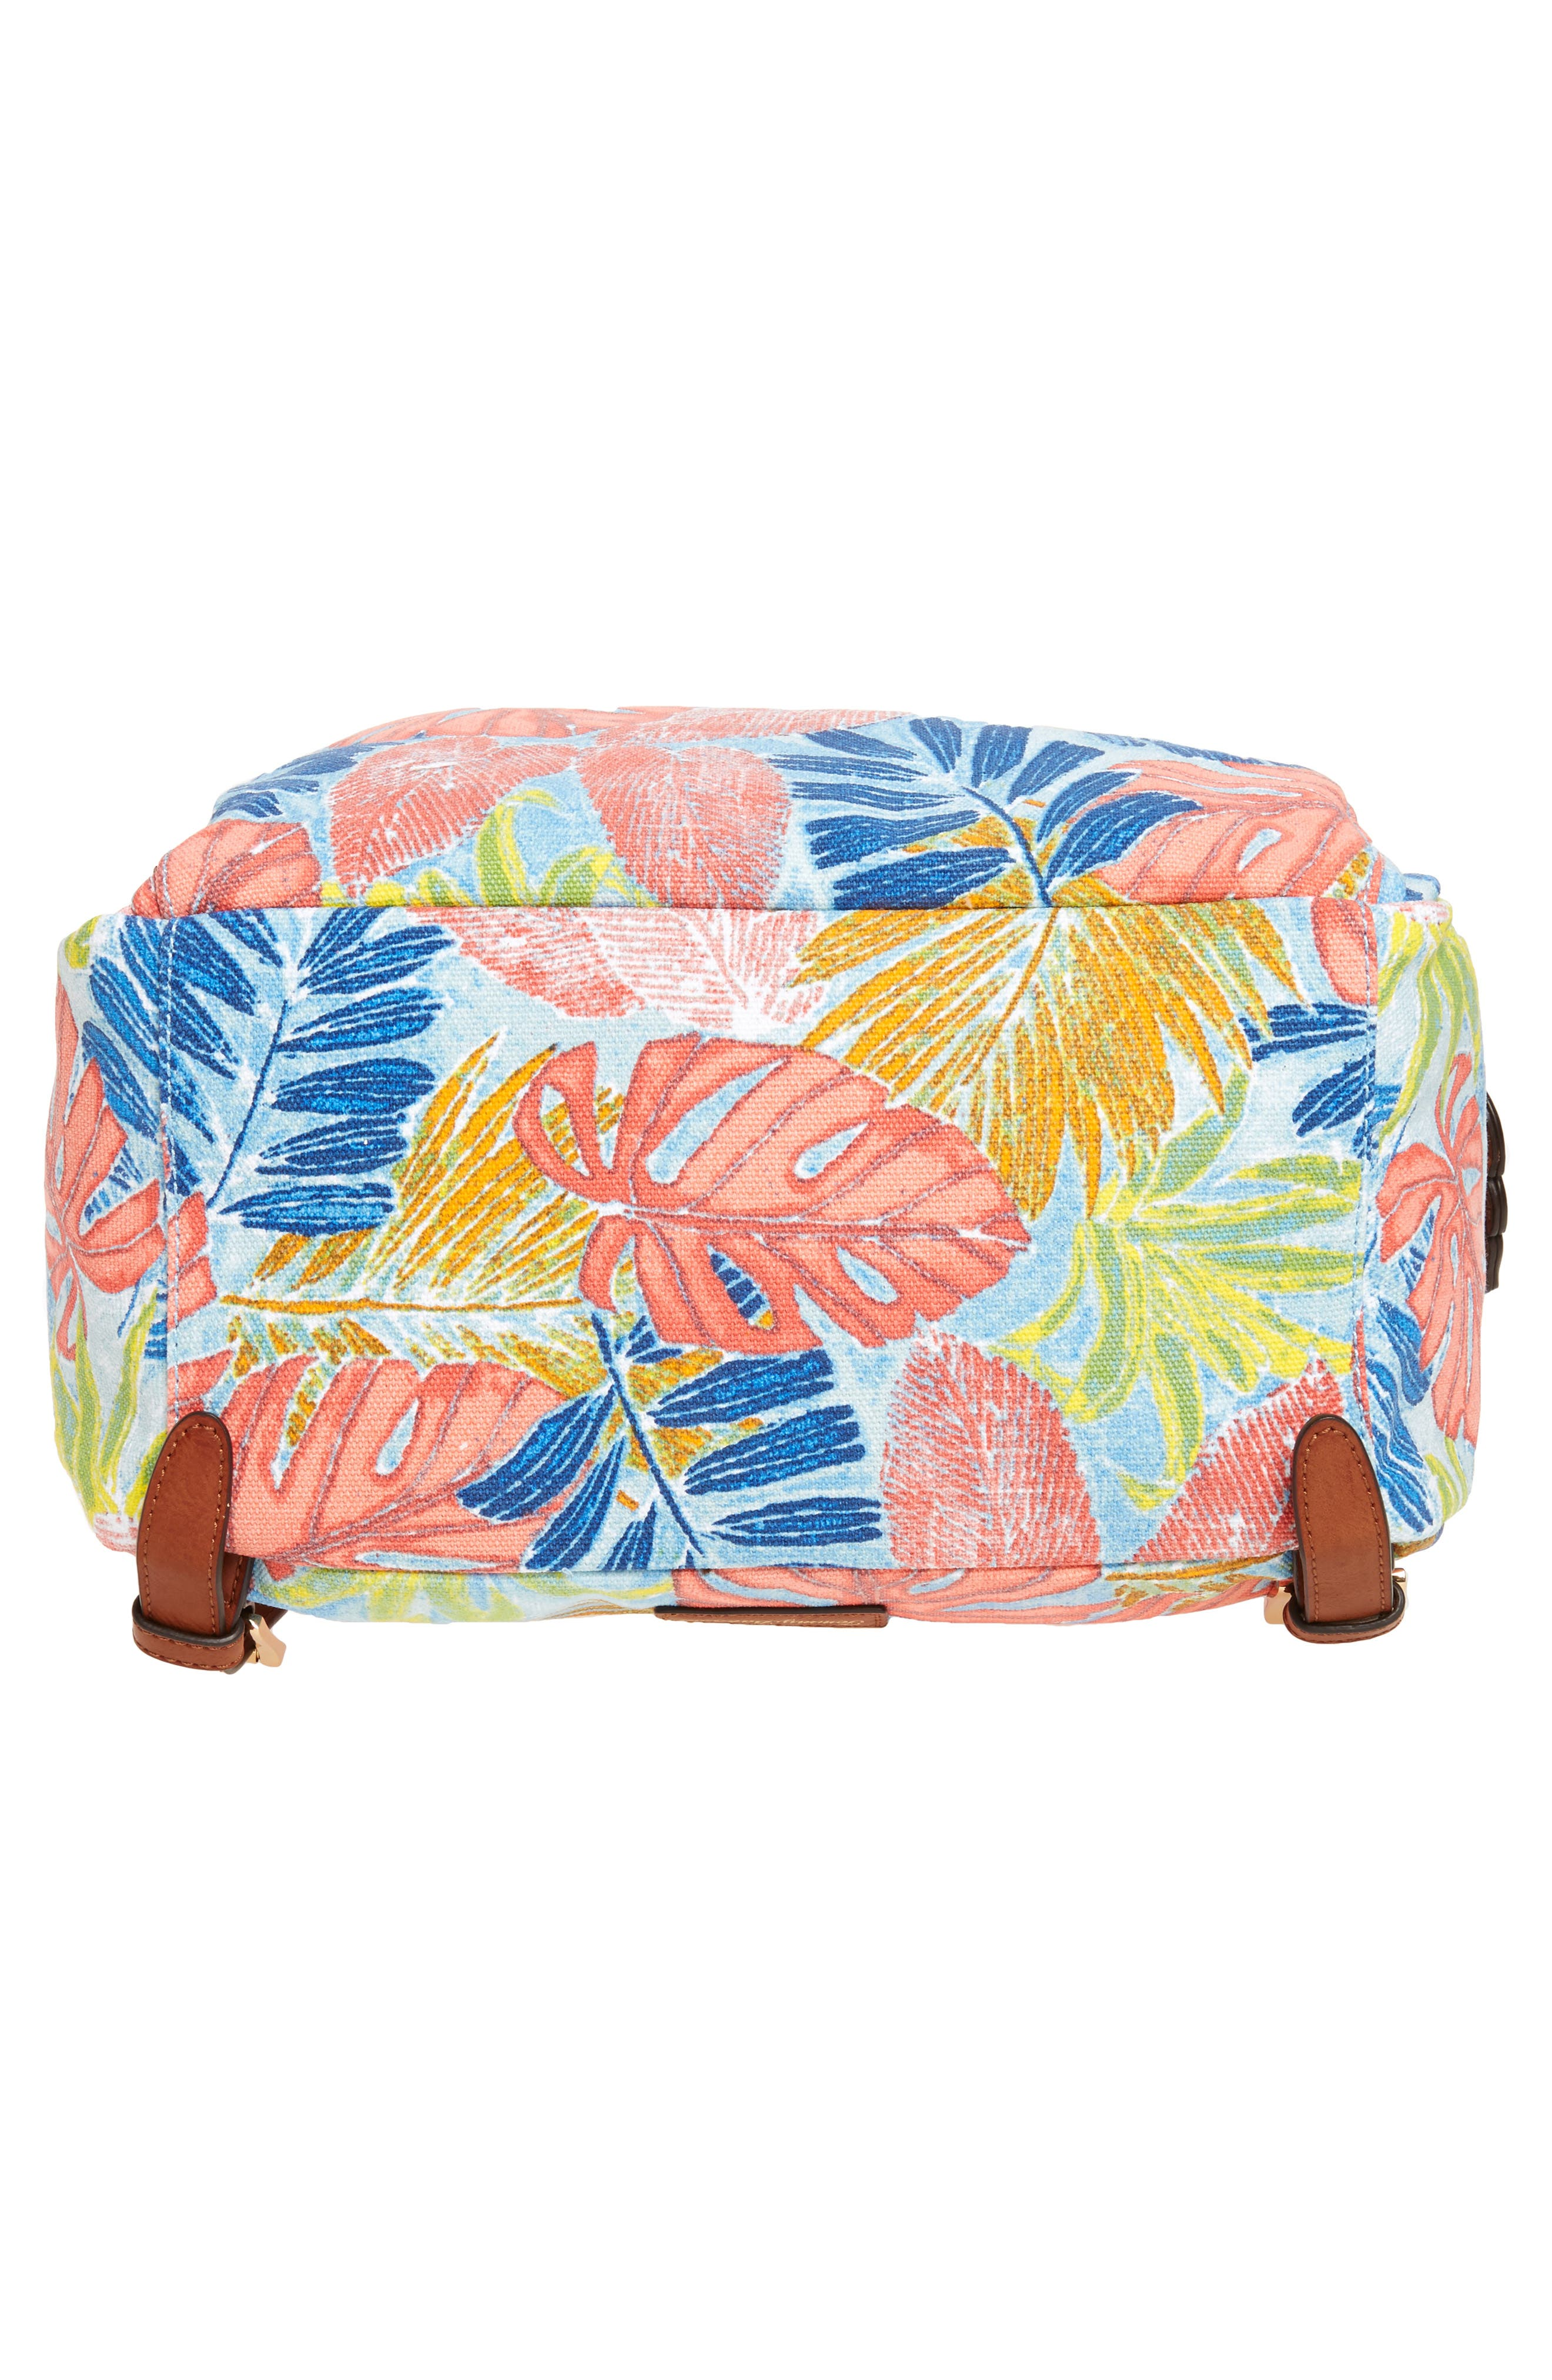 Maui Backpack,                             Alternate thumbnail 6, color,                             Artsy Leaf